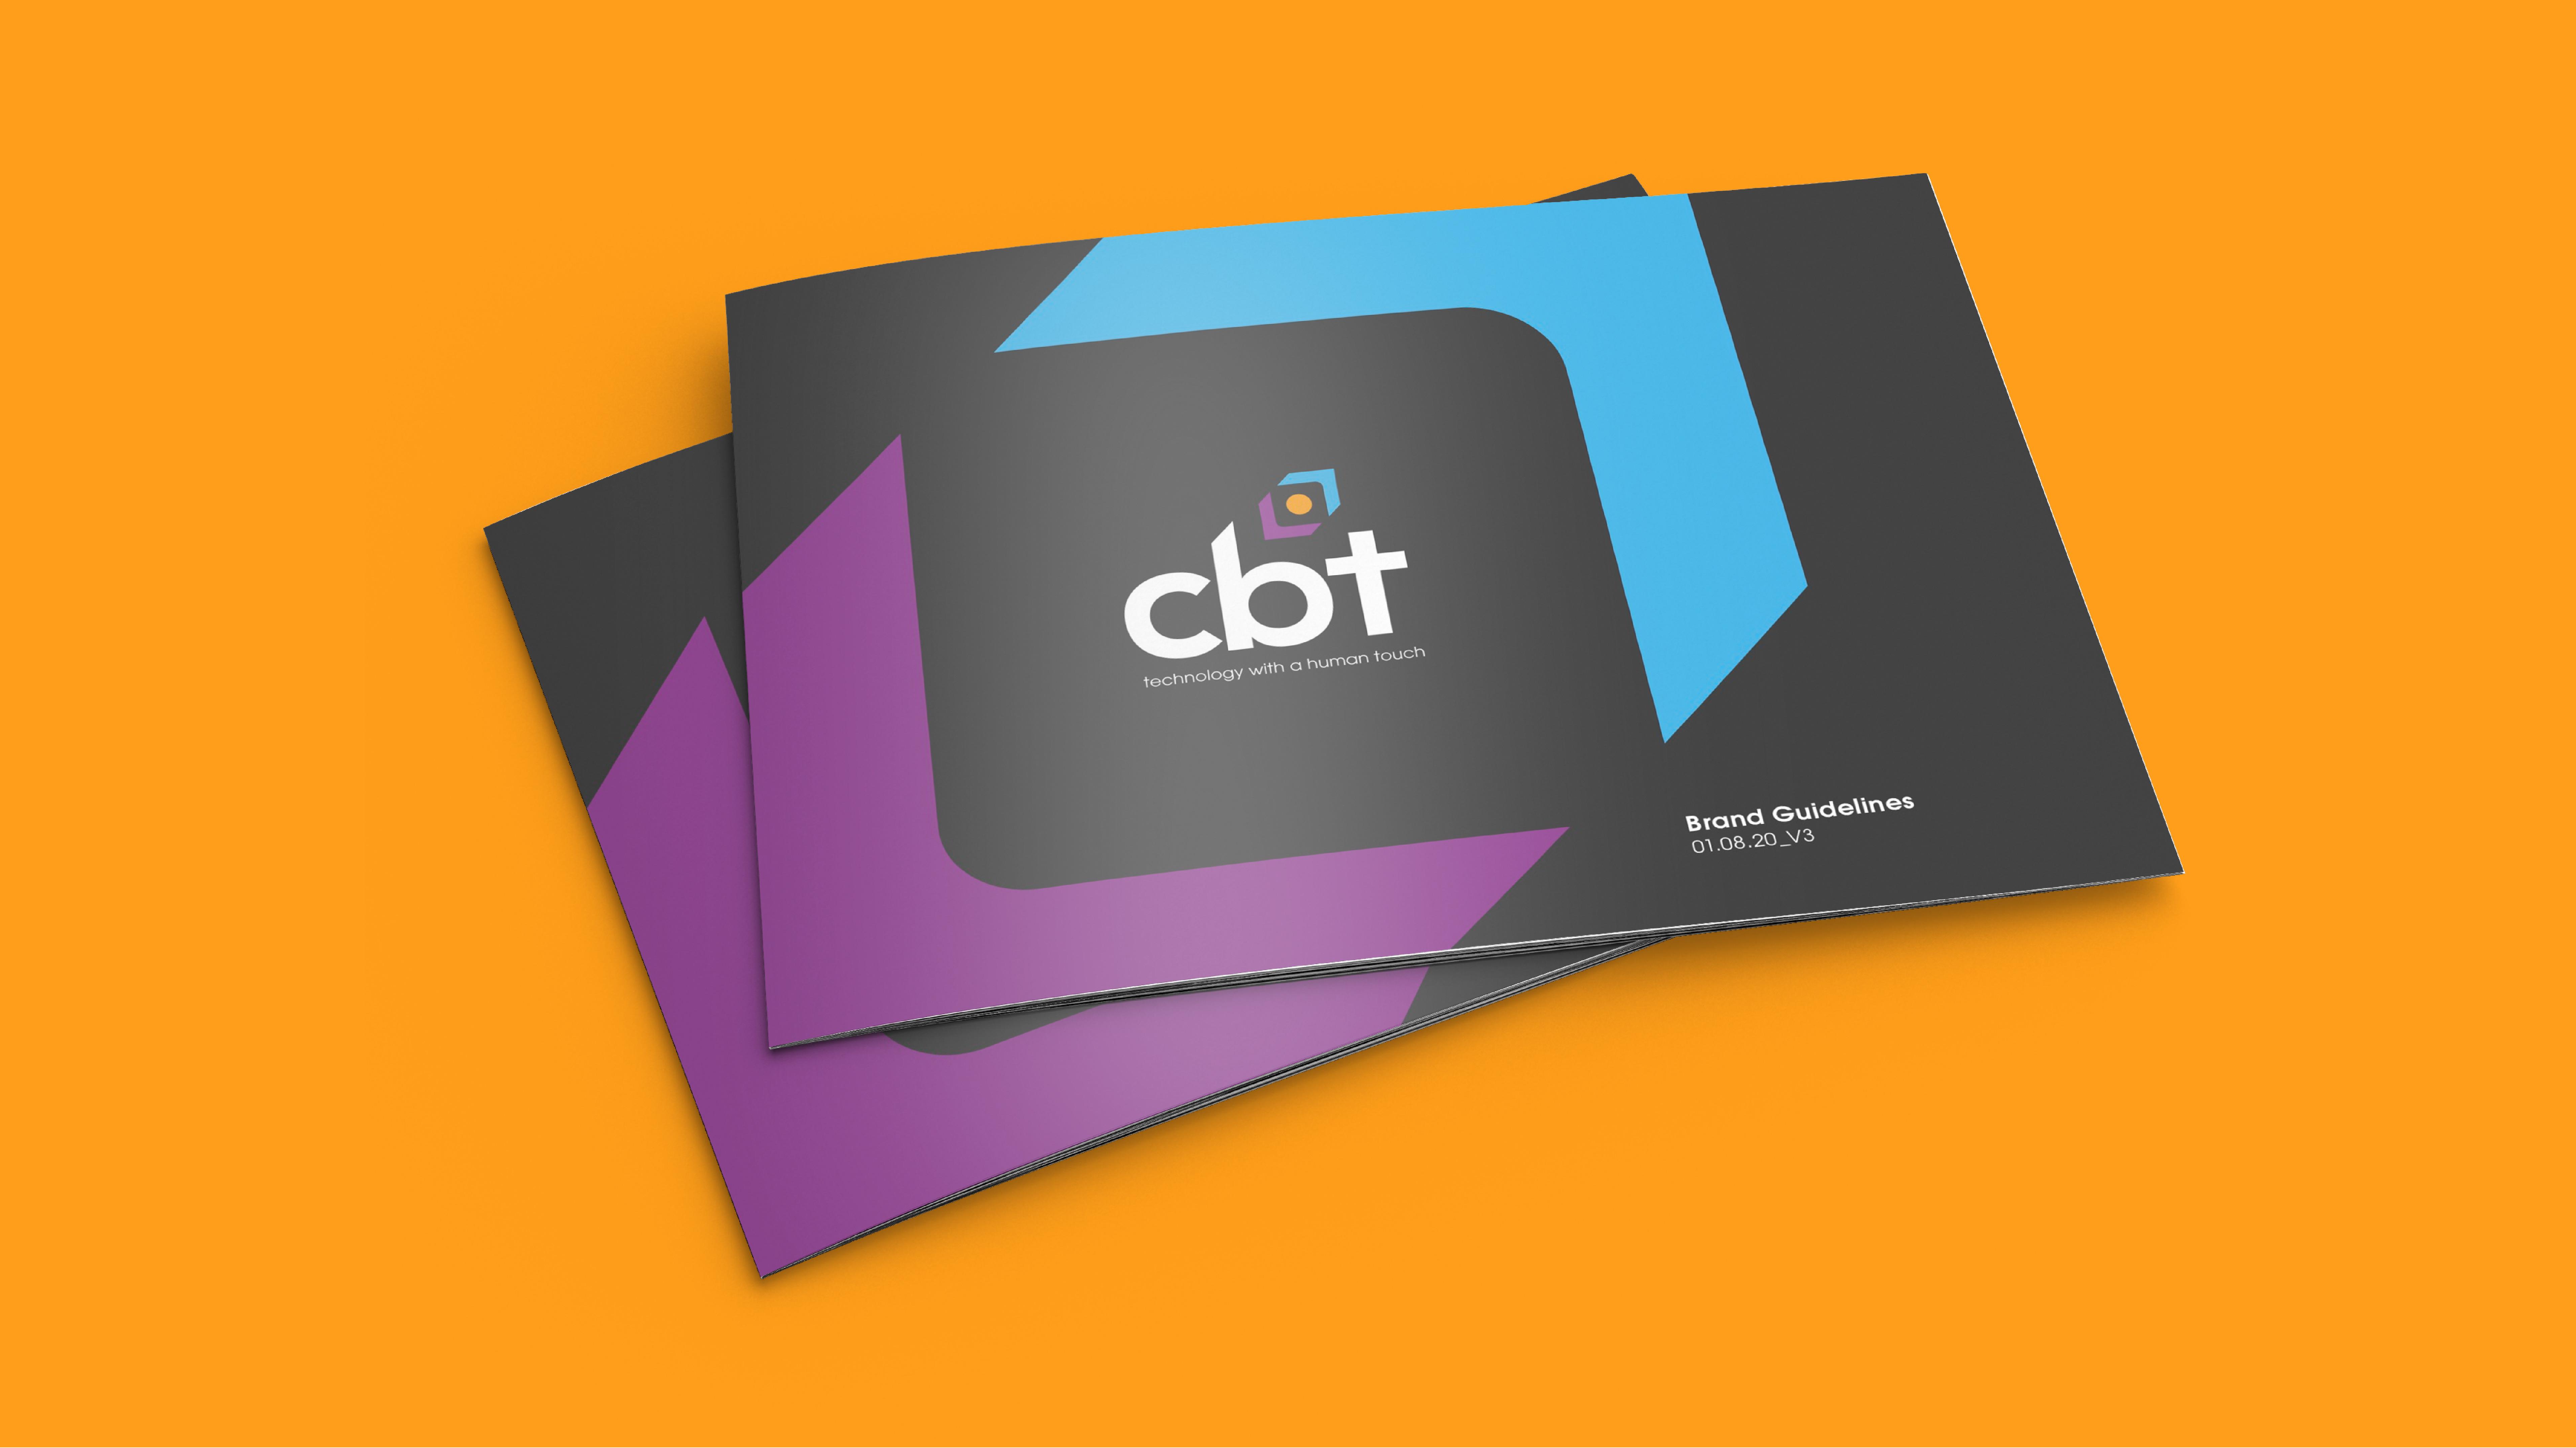 cbt stationery design